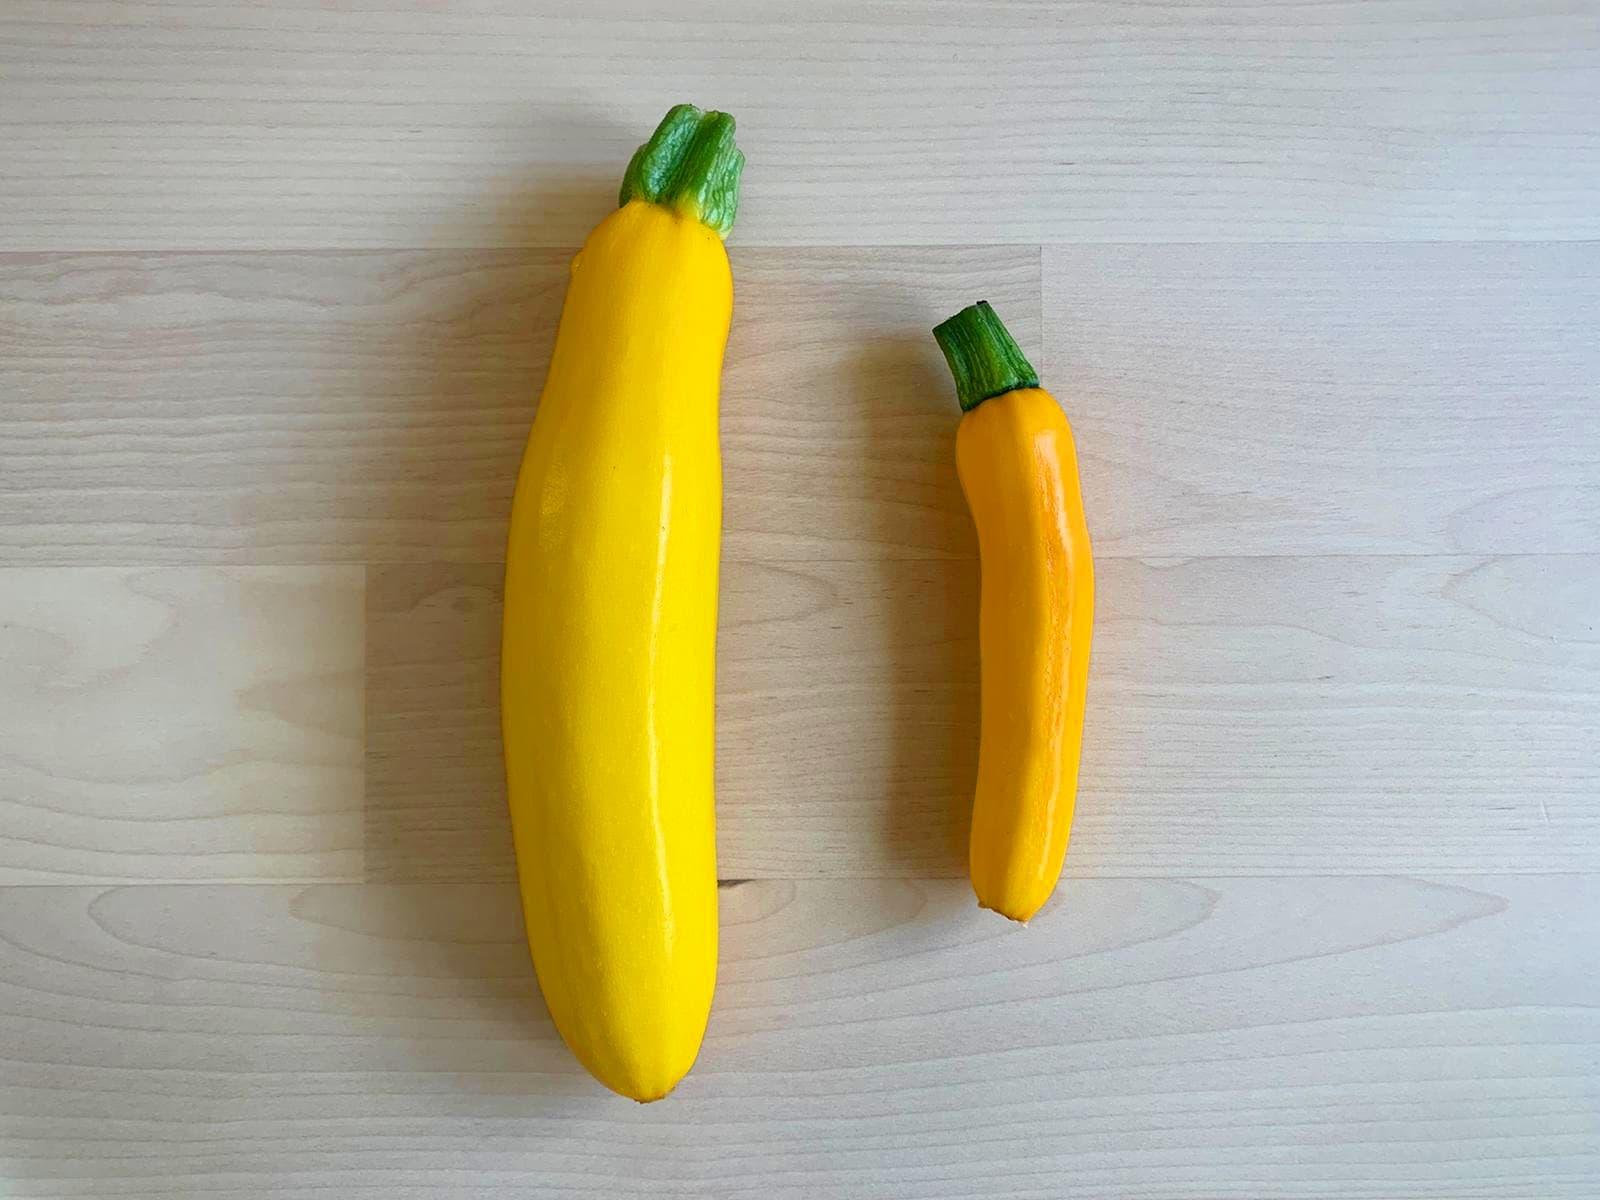 小空間也可以種黃色夏季南瓜/櫛(節)瓜|Growing yellow summer squash in small spaces – 10387 km